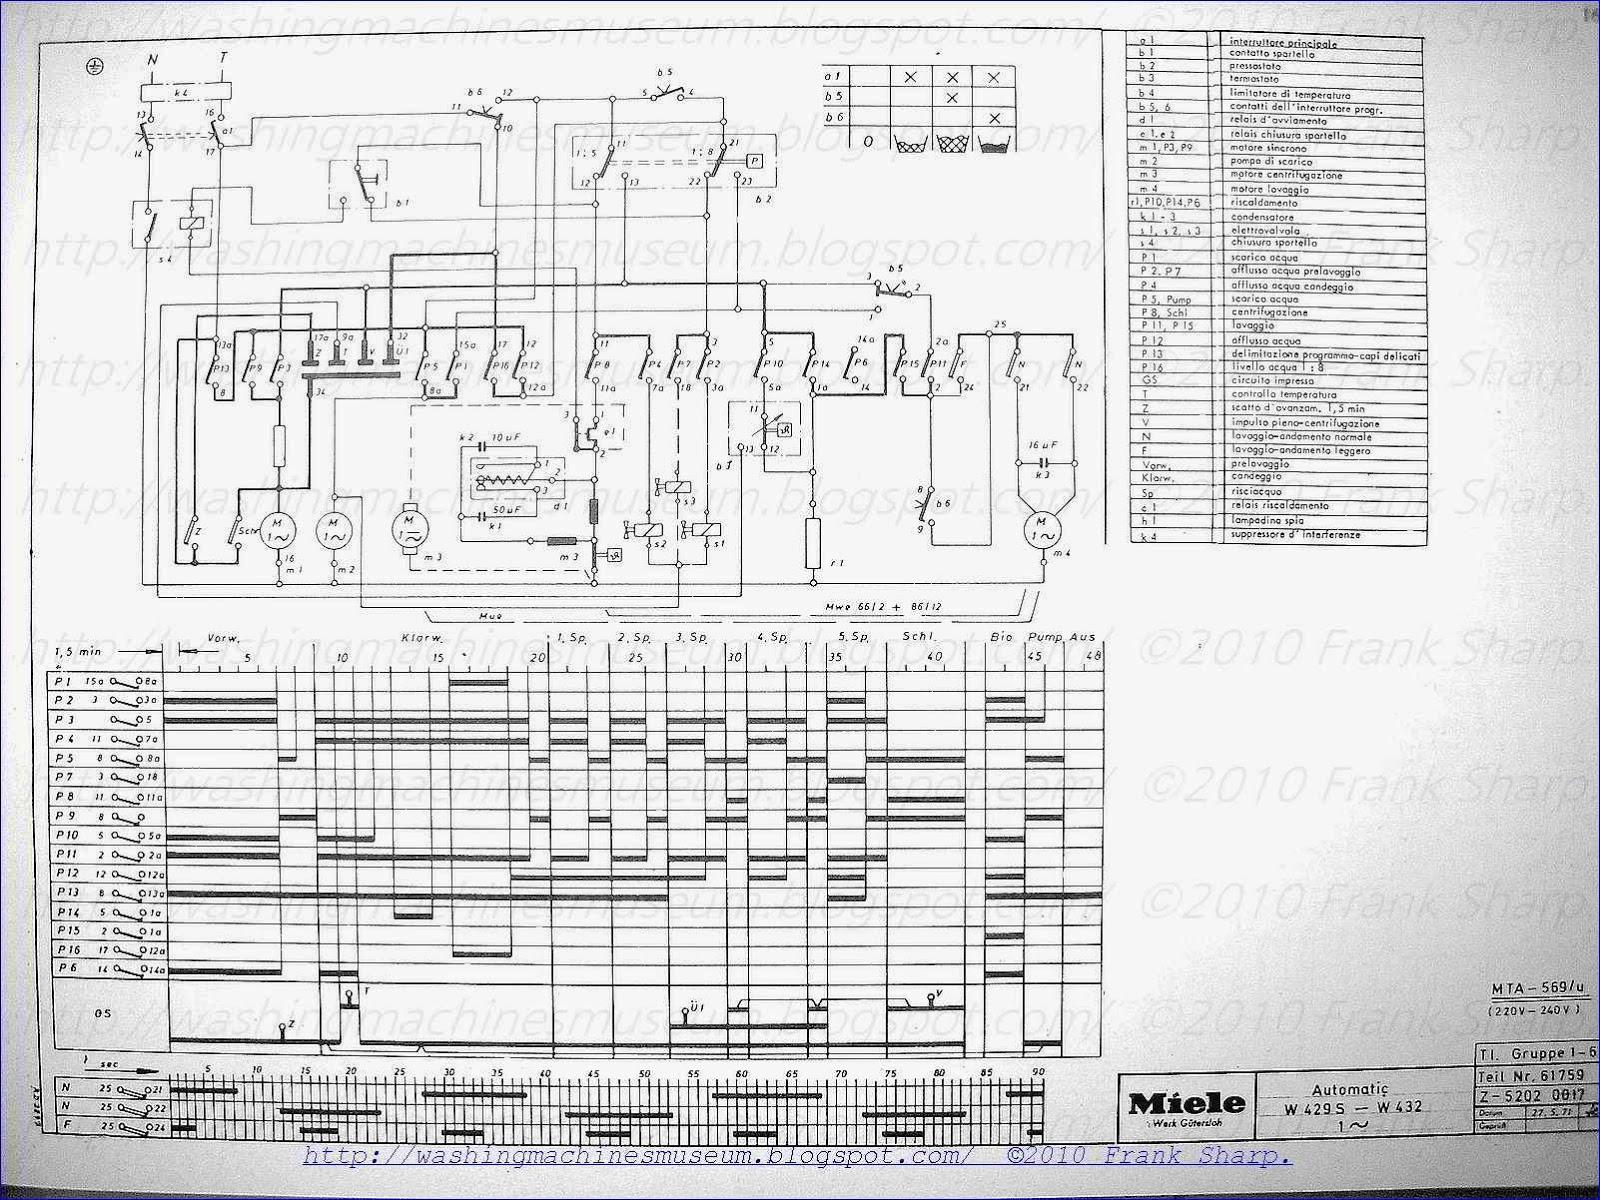 Washer Rama Museum: MIELE AUTOMATIC W429S  W432 SCHEMATIC DIAGRAM